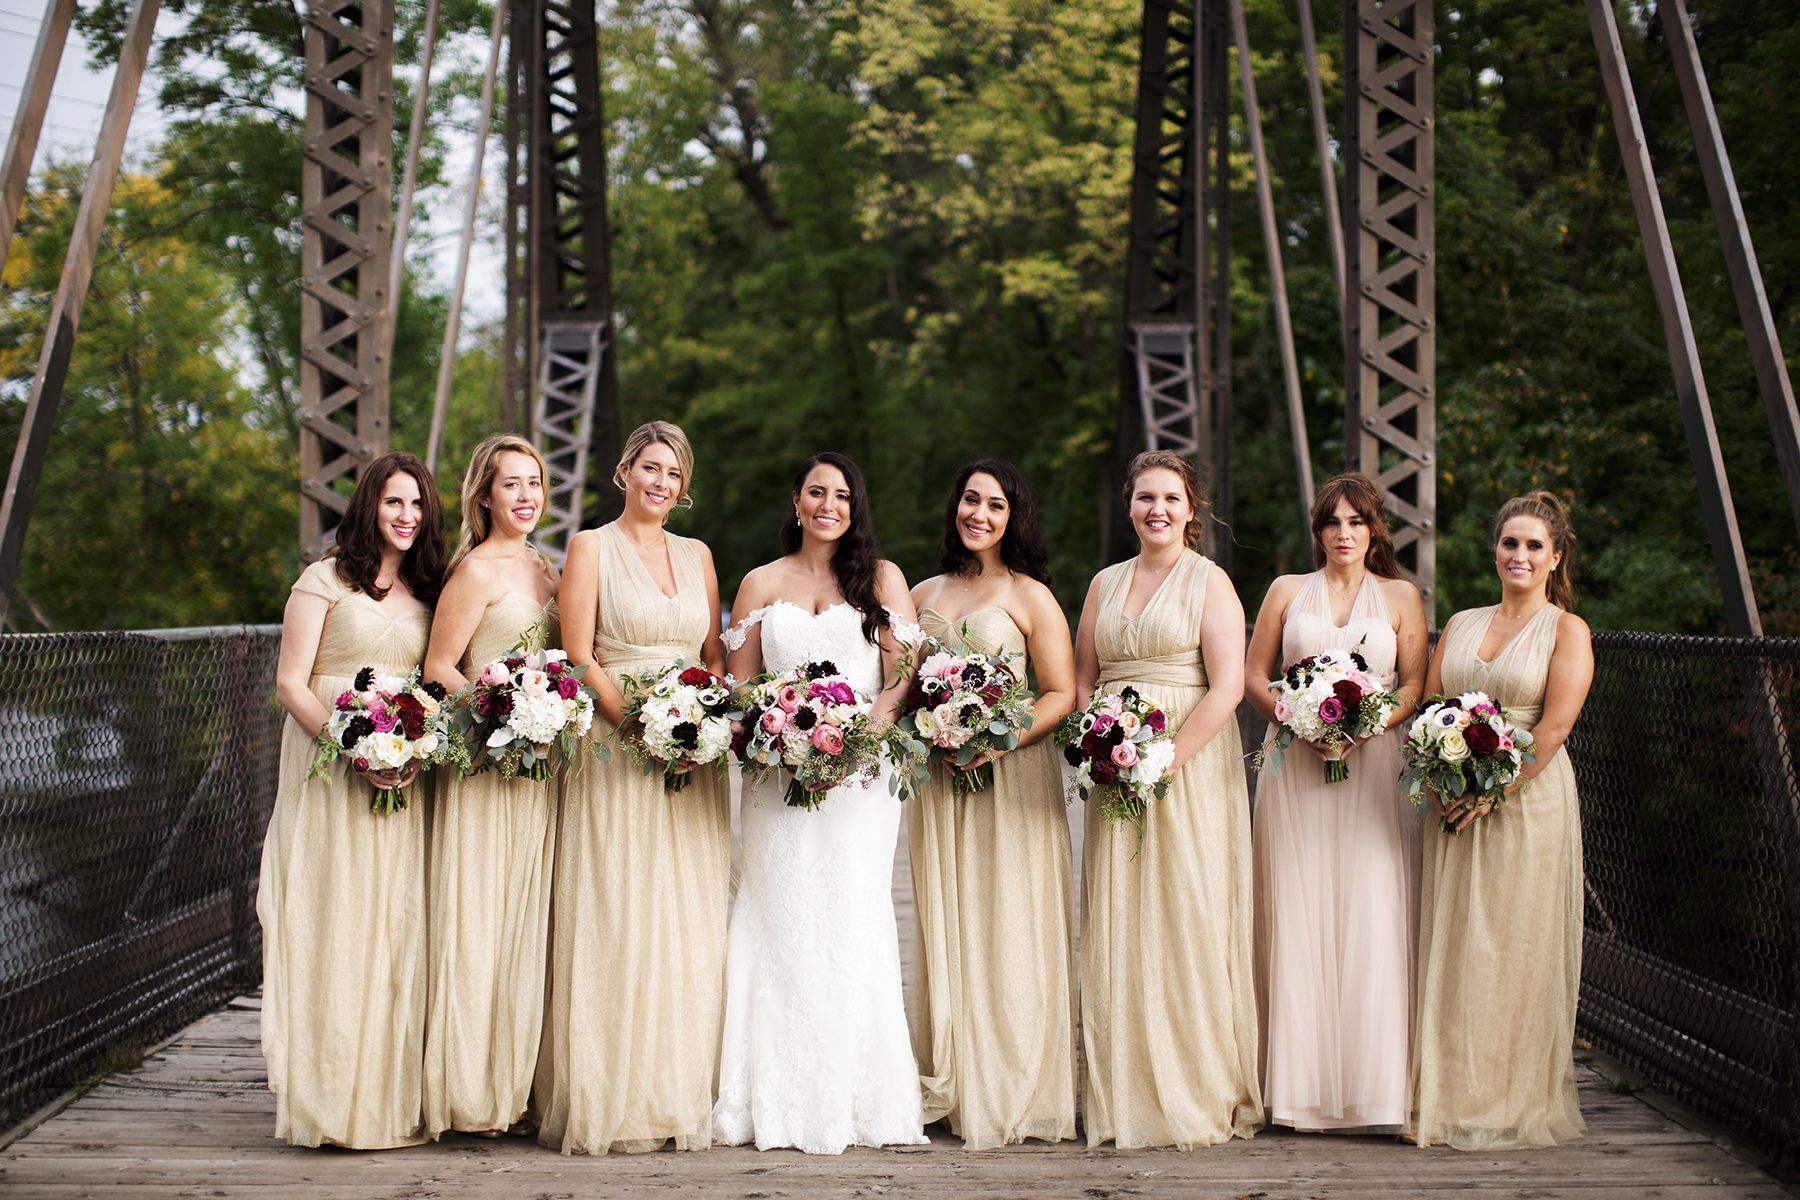 Mara dan minneapolis event centers wedding